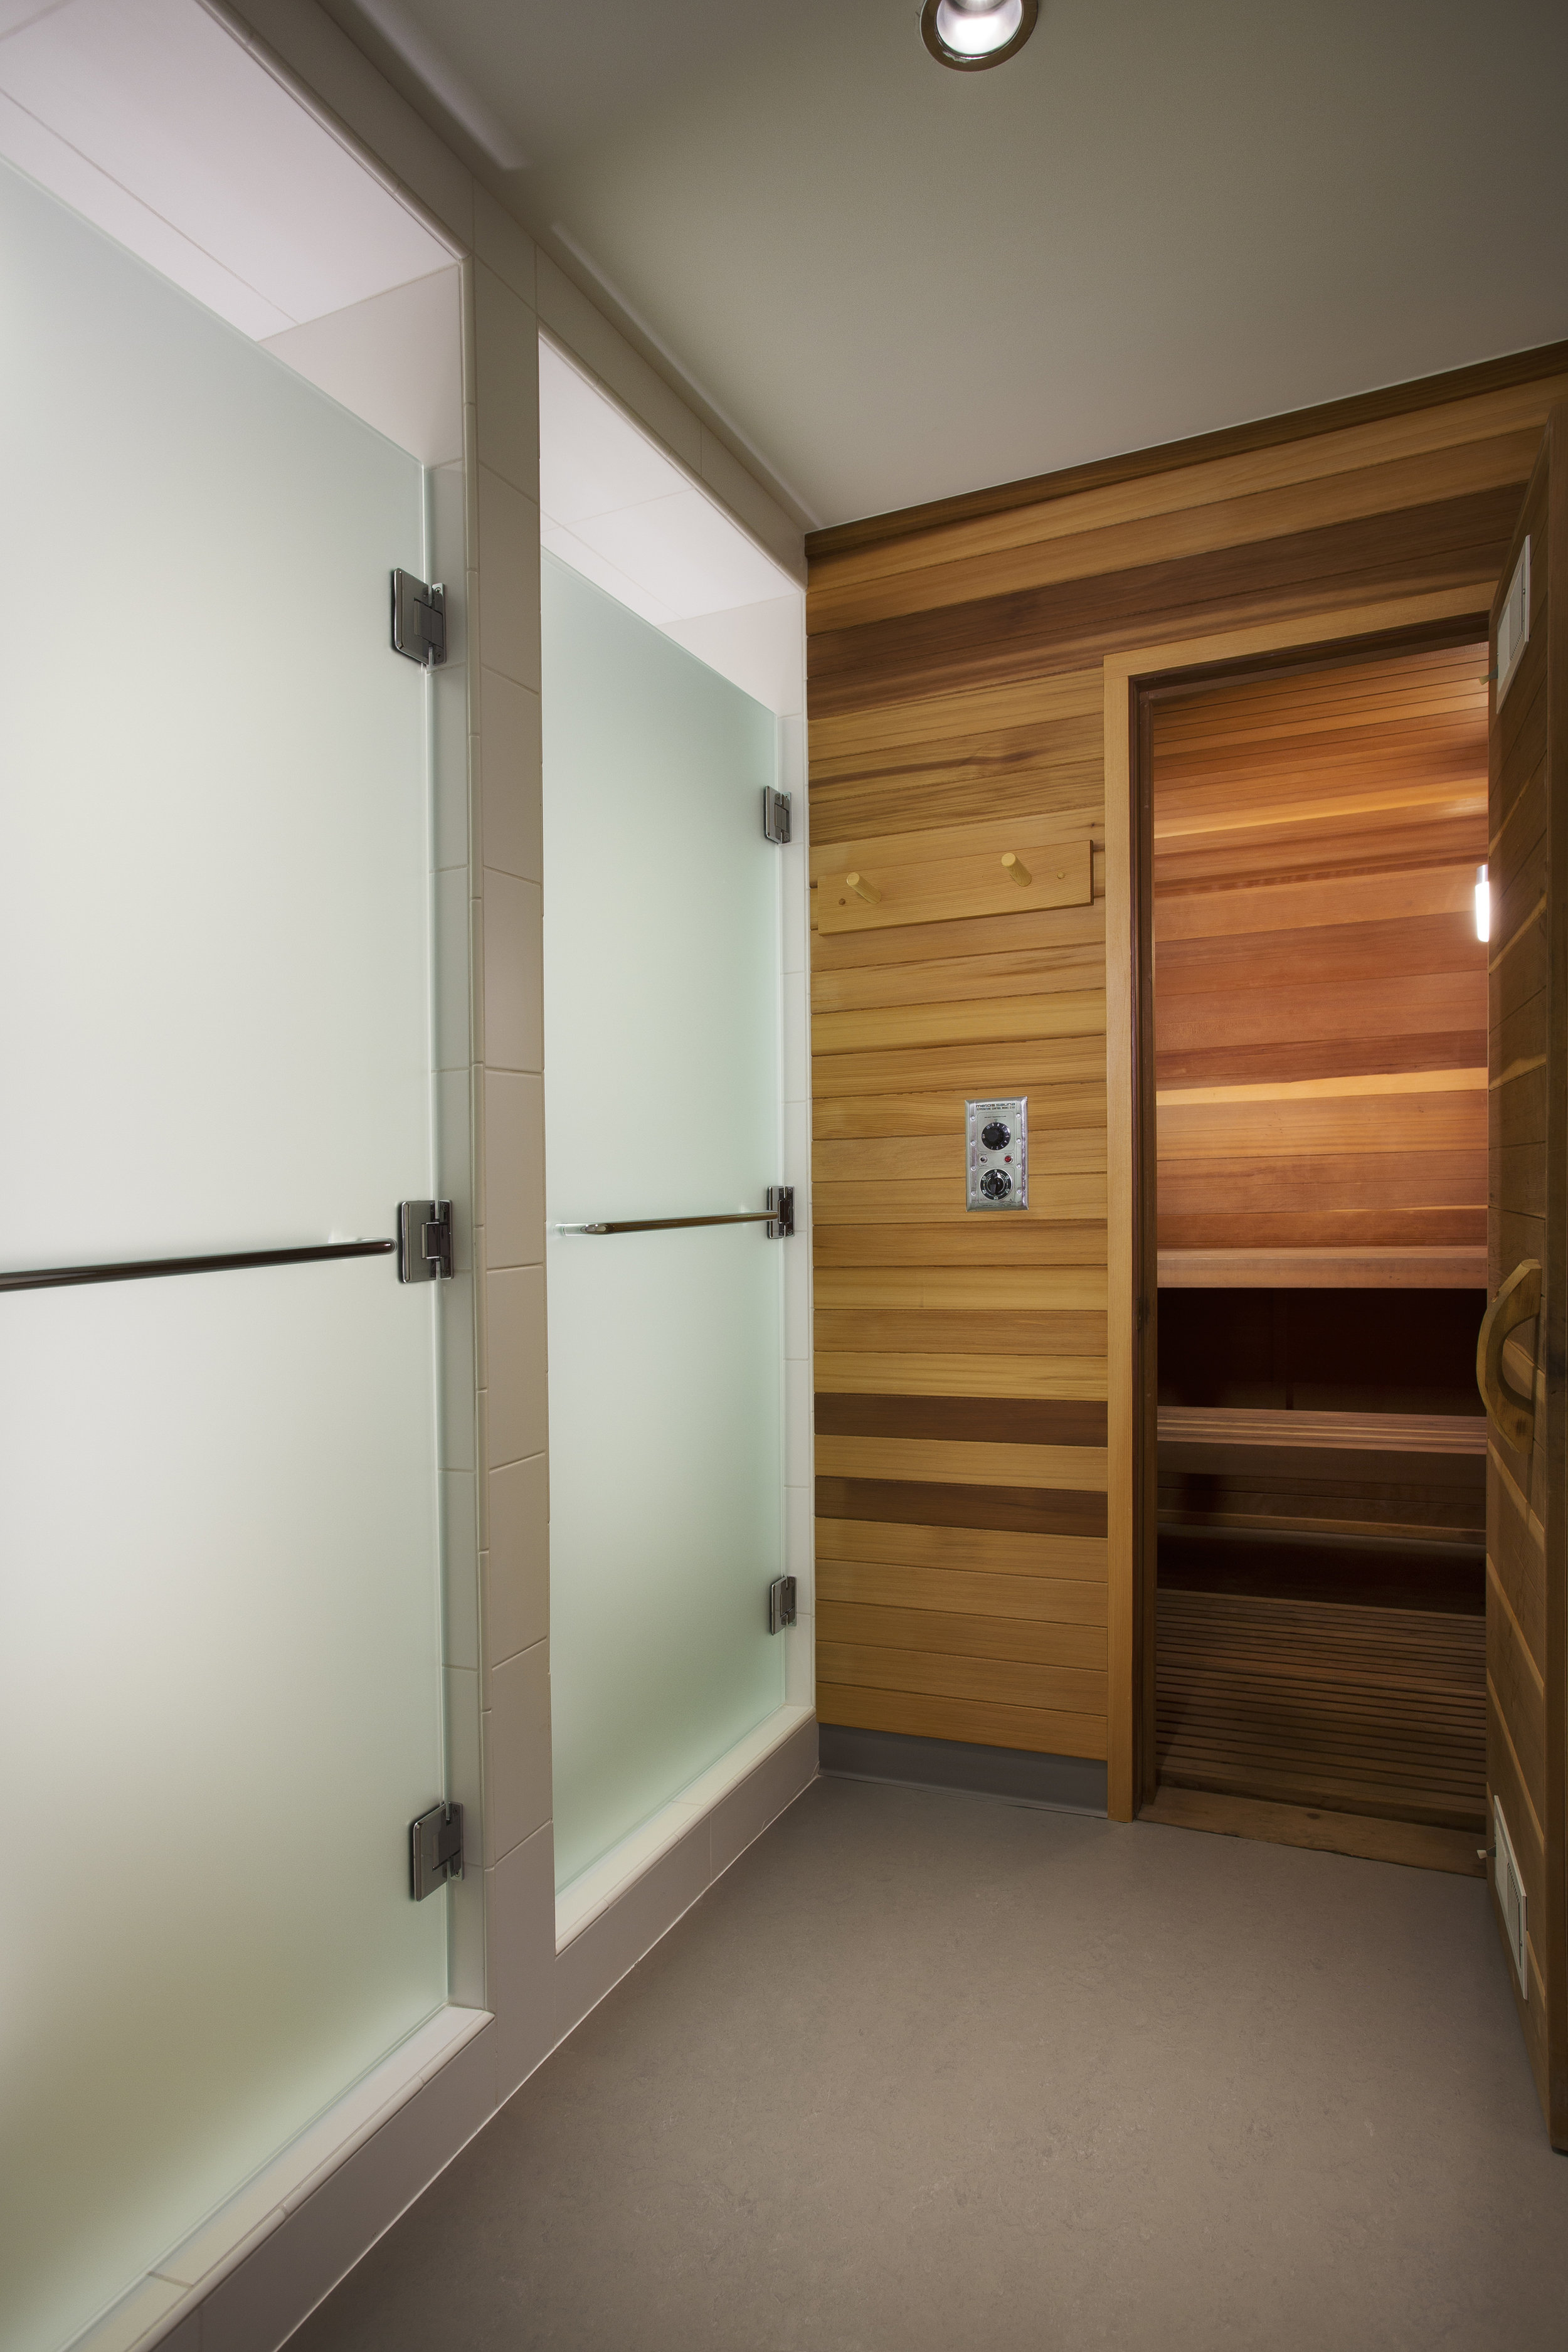 sauna_final_8bit.jpg